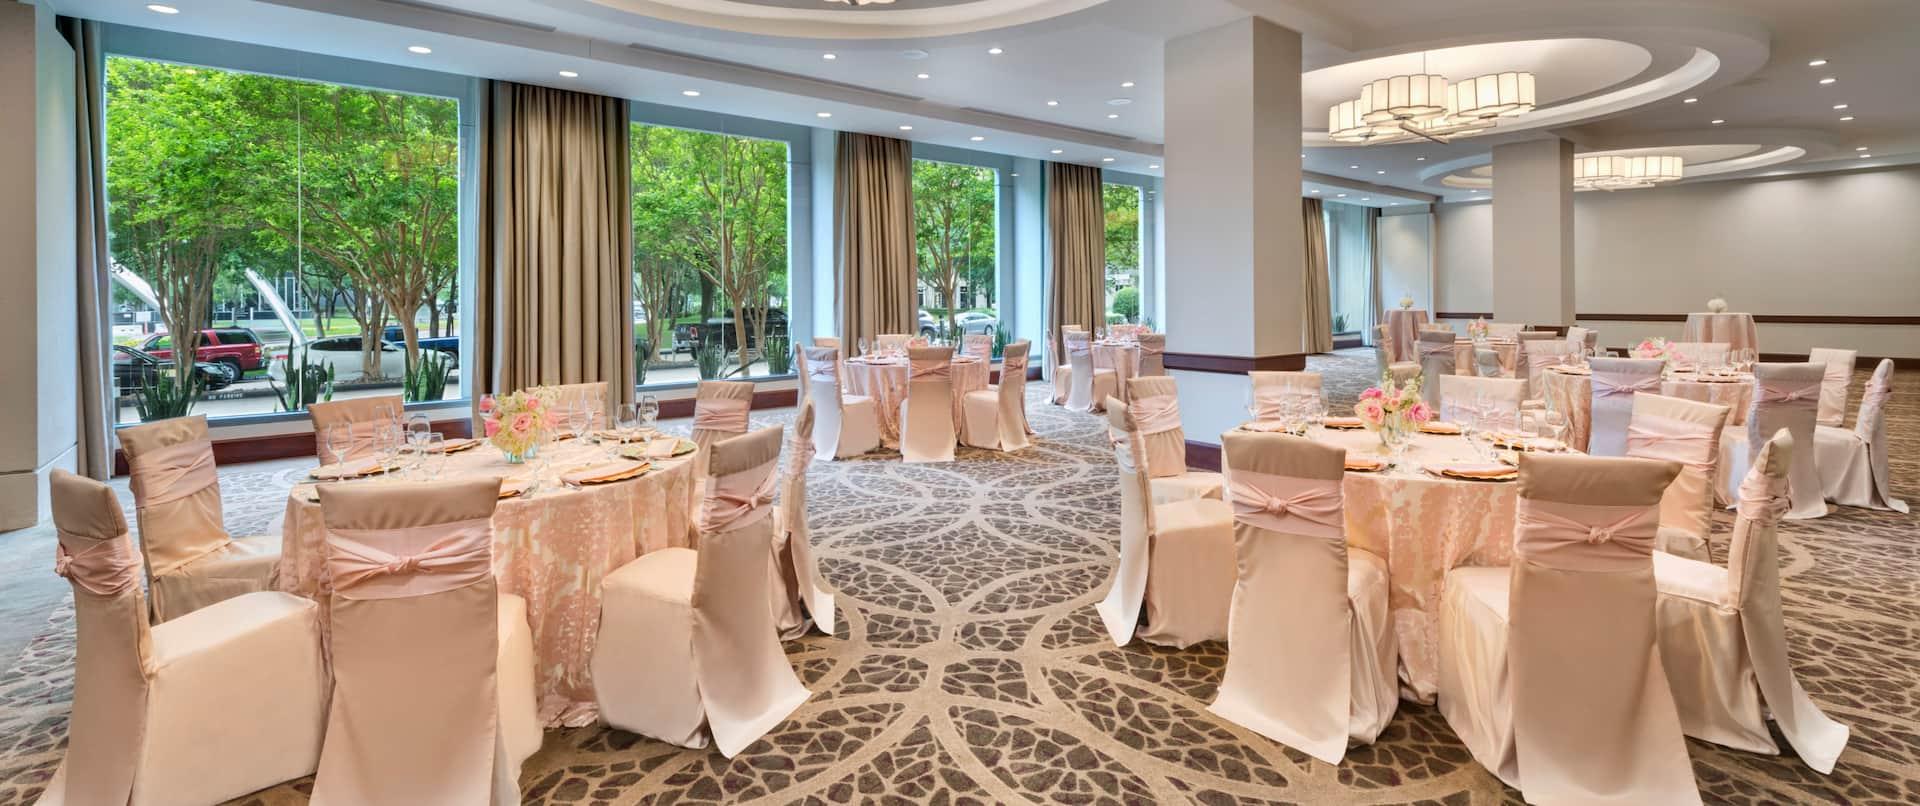 Ballroom Reception Setup